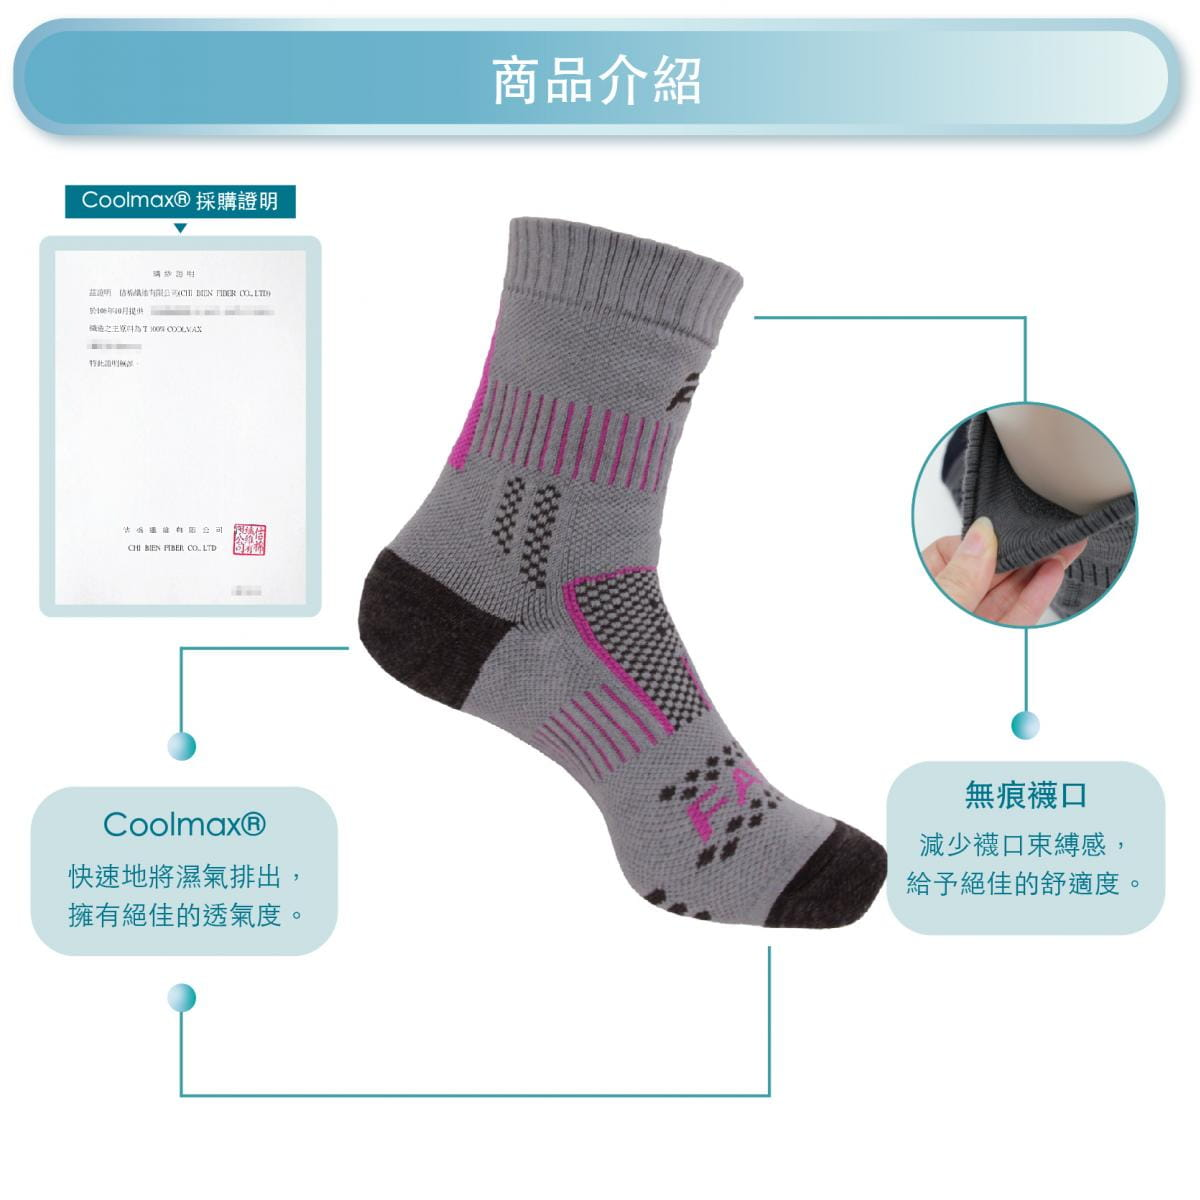 【FAV】止滑加厚保暖登山襪 1